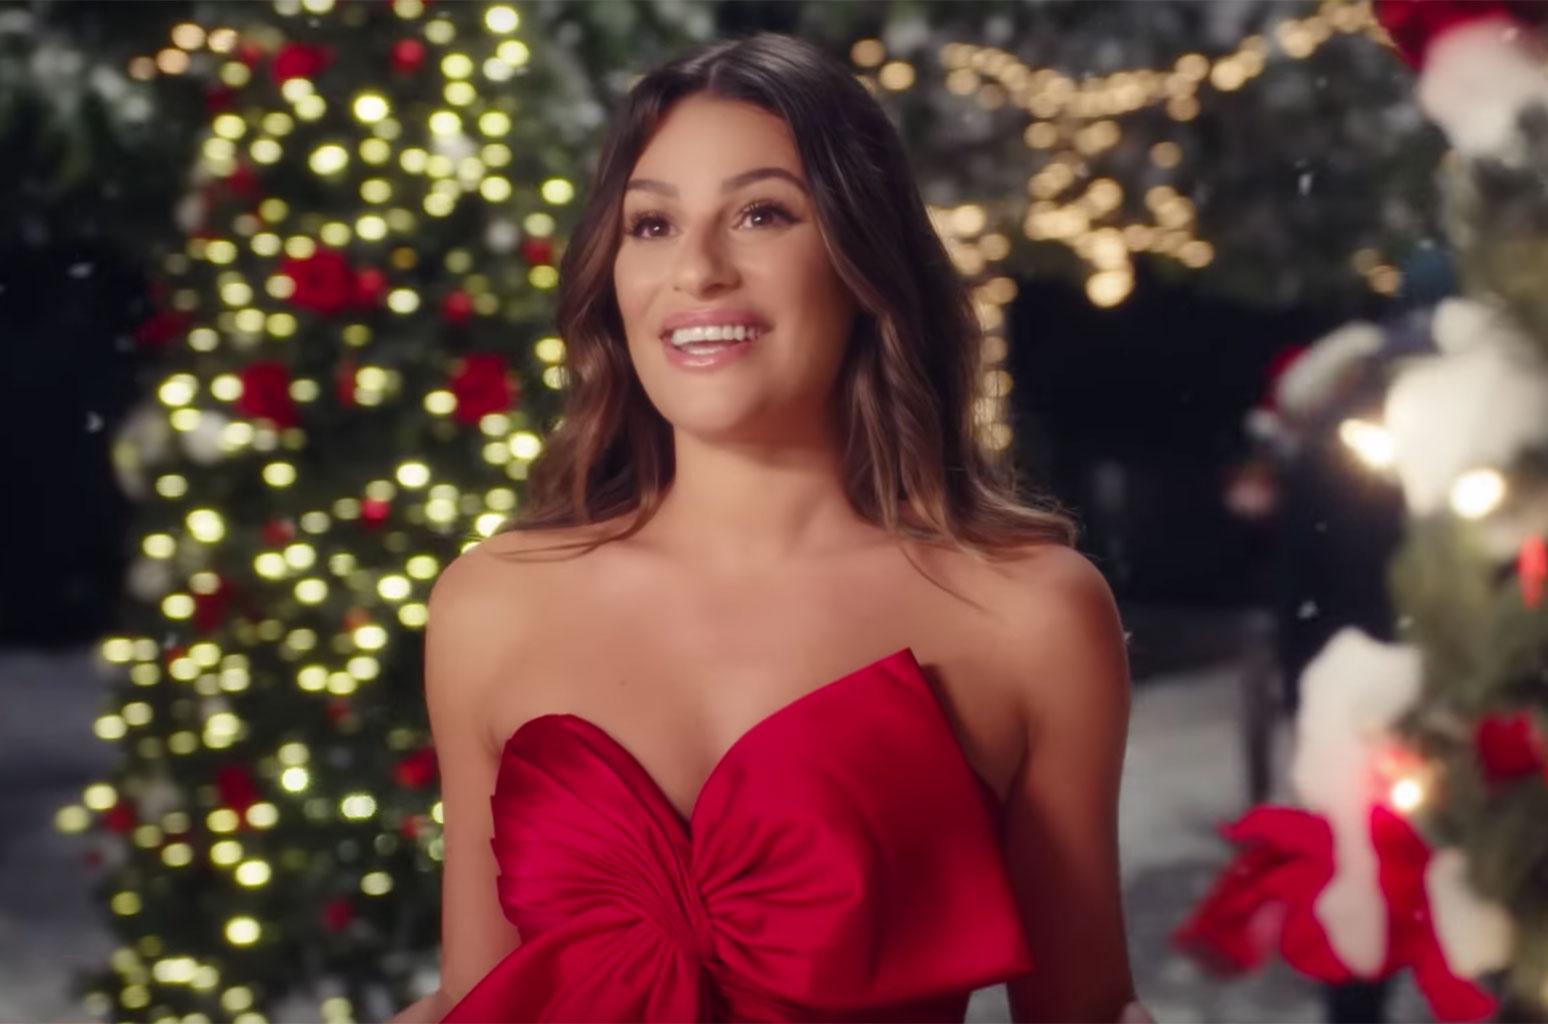 lea-michele-christmas-in-new-york-2019-billboard-1548